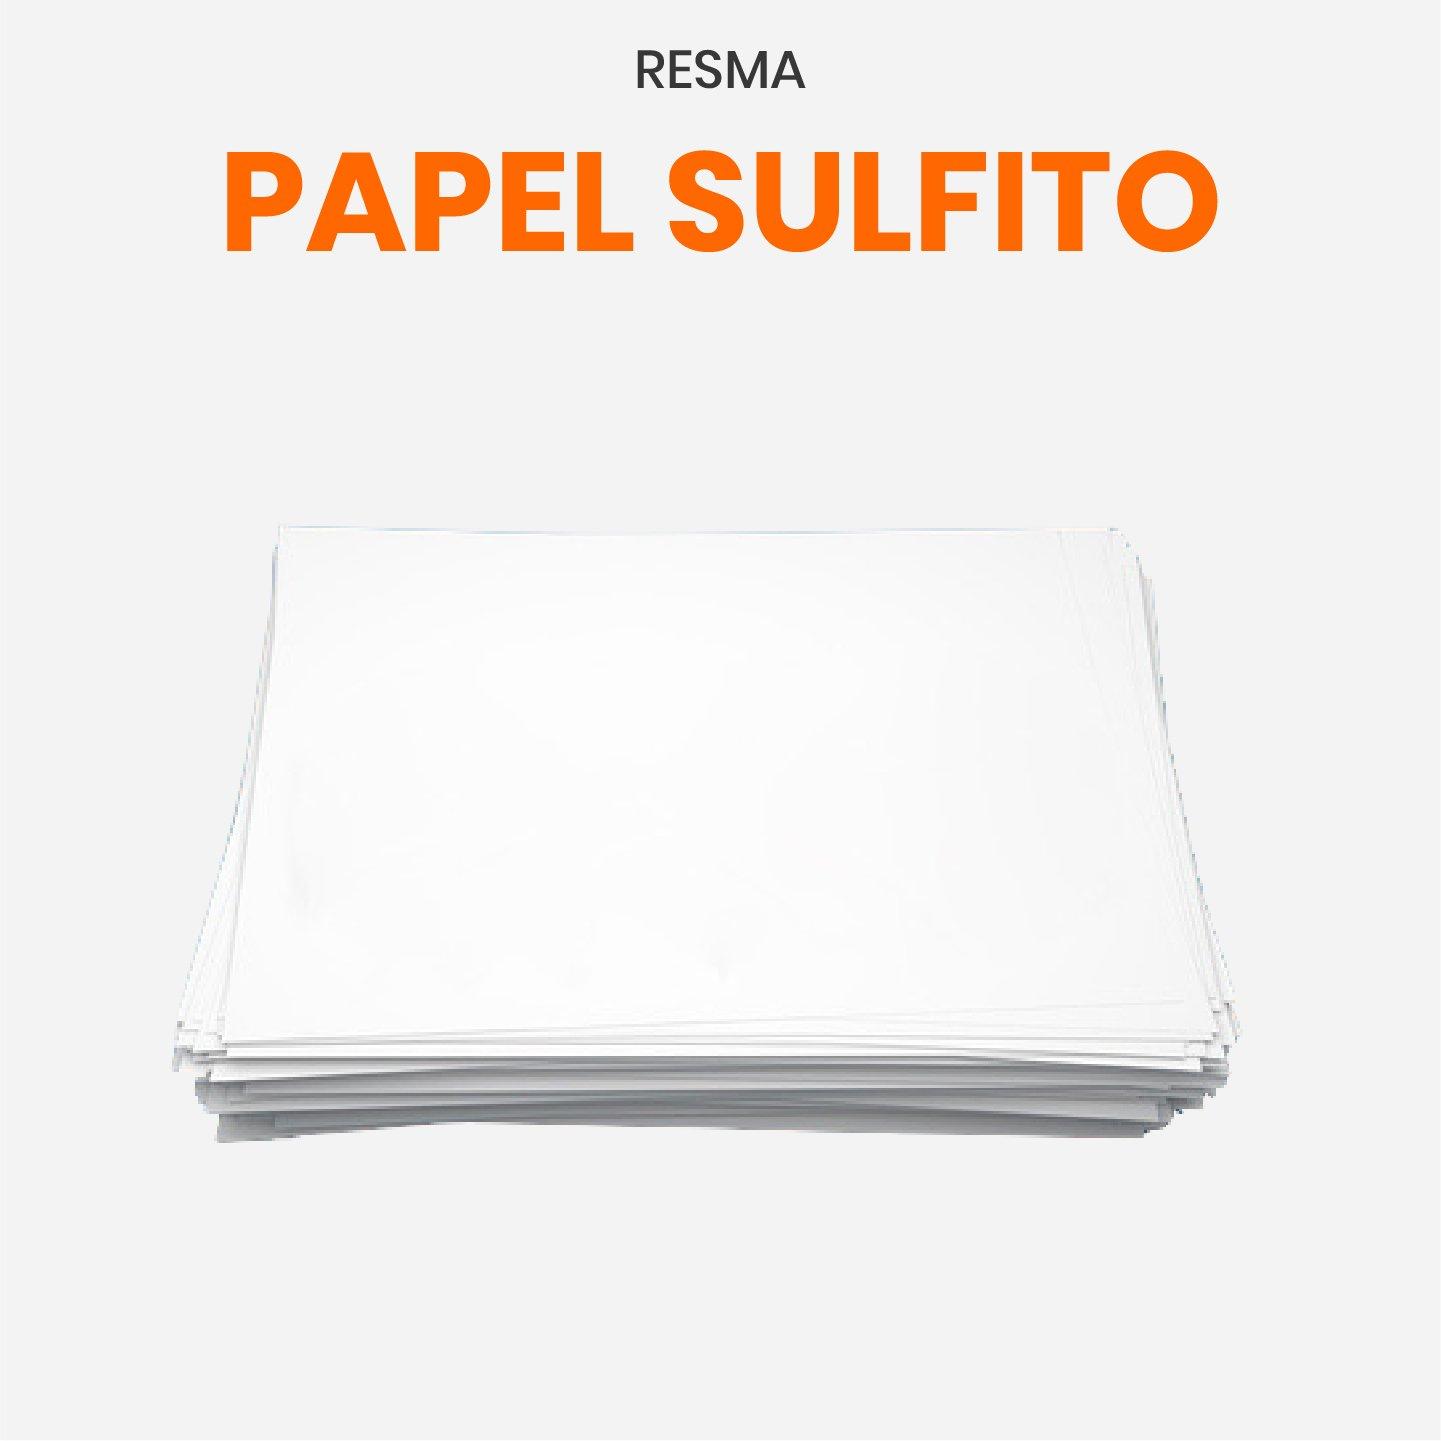 Resma de papel sulfito 10 kg